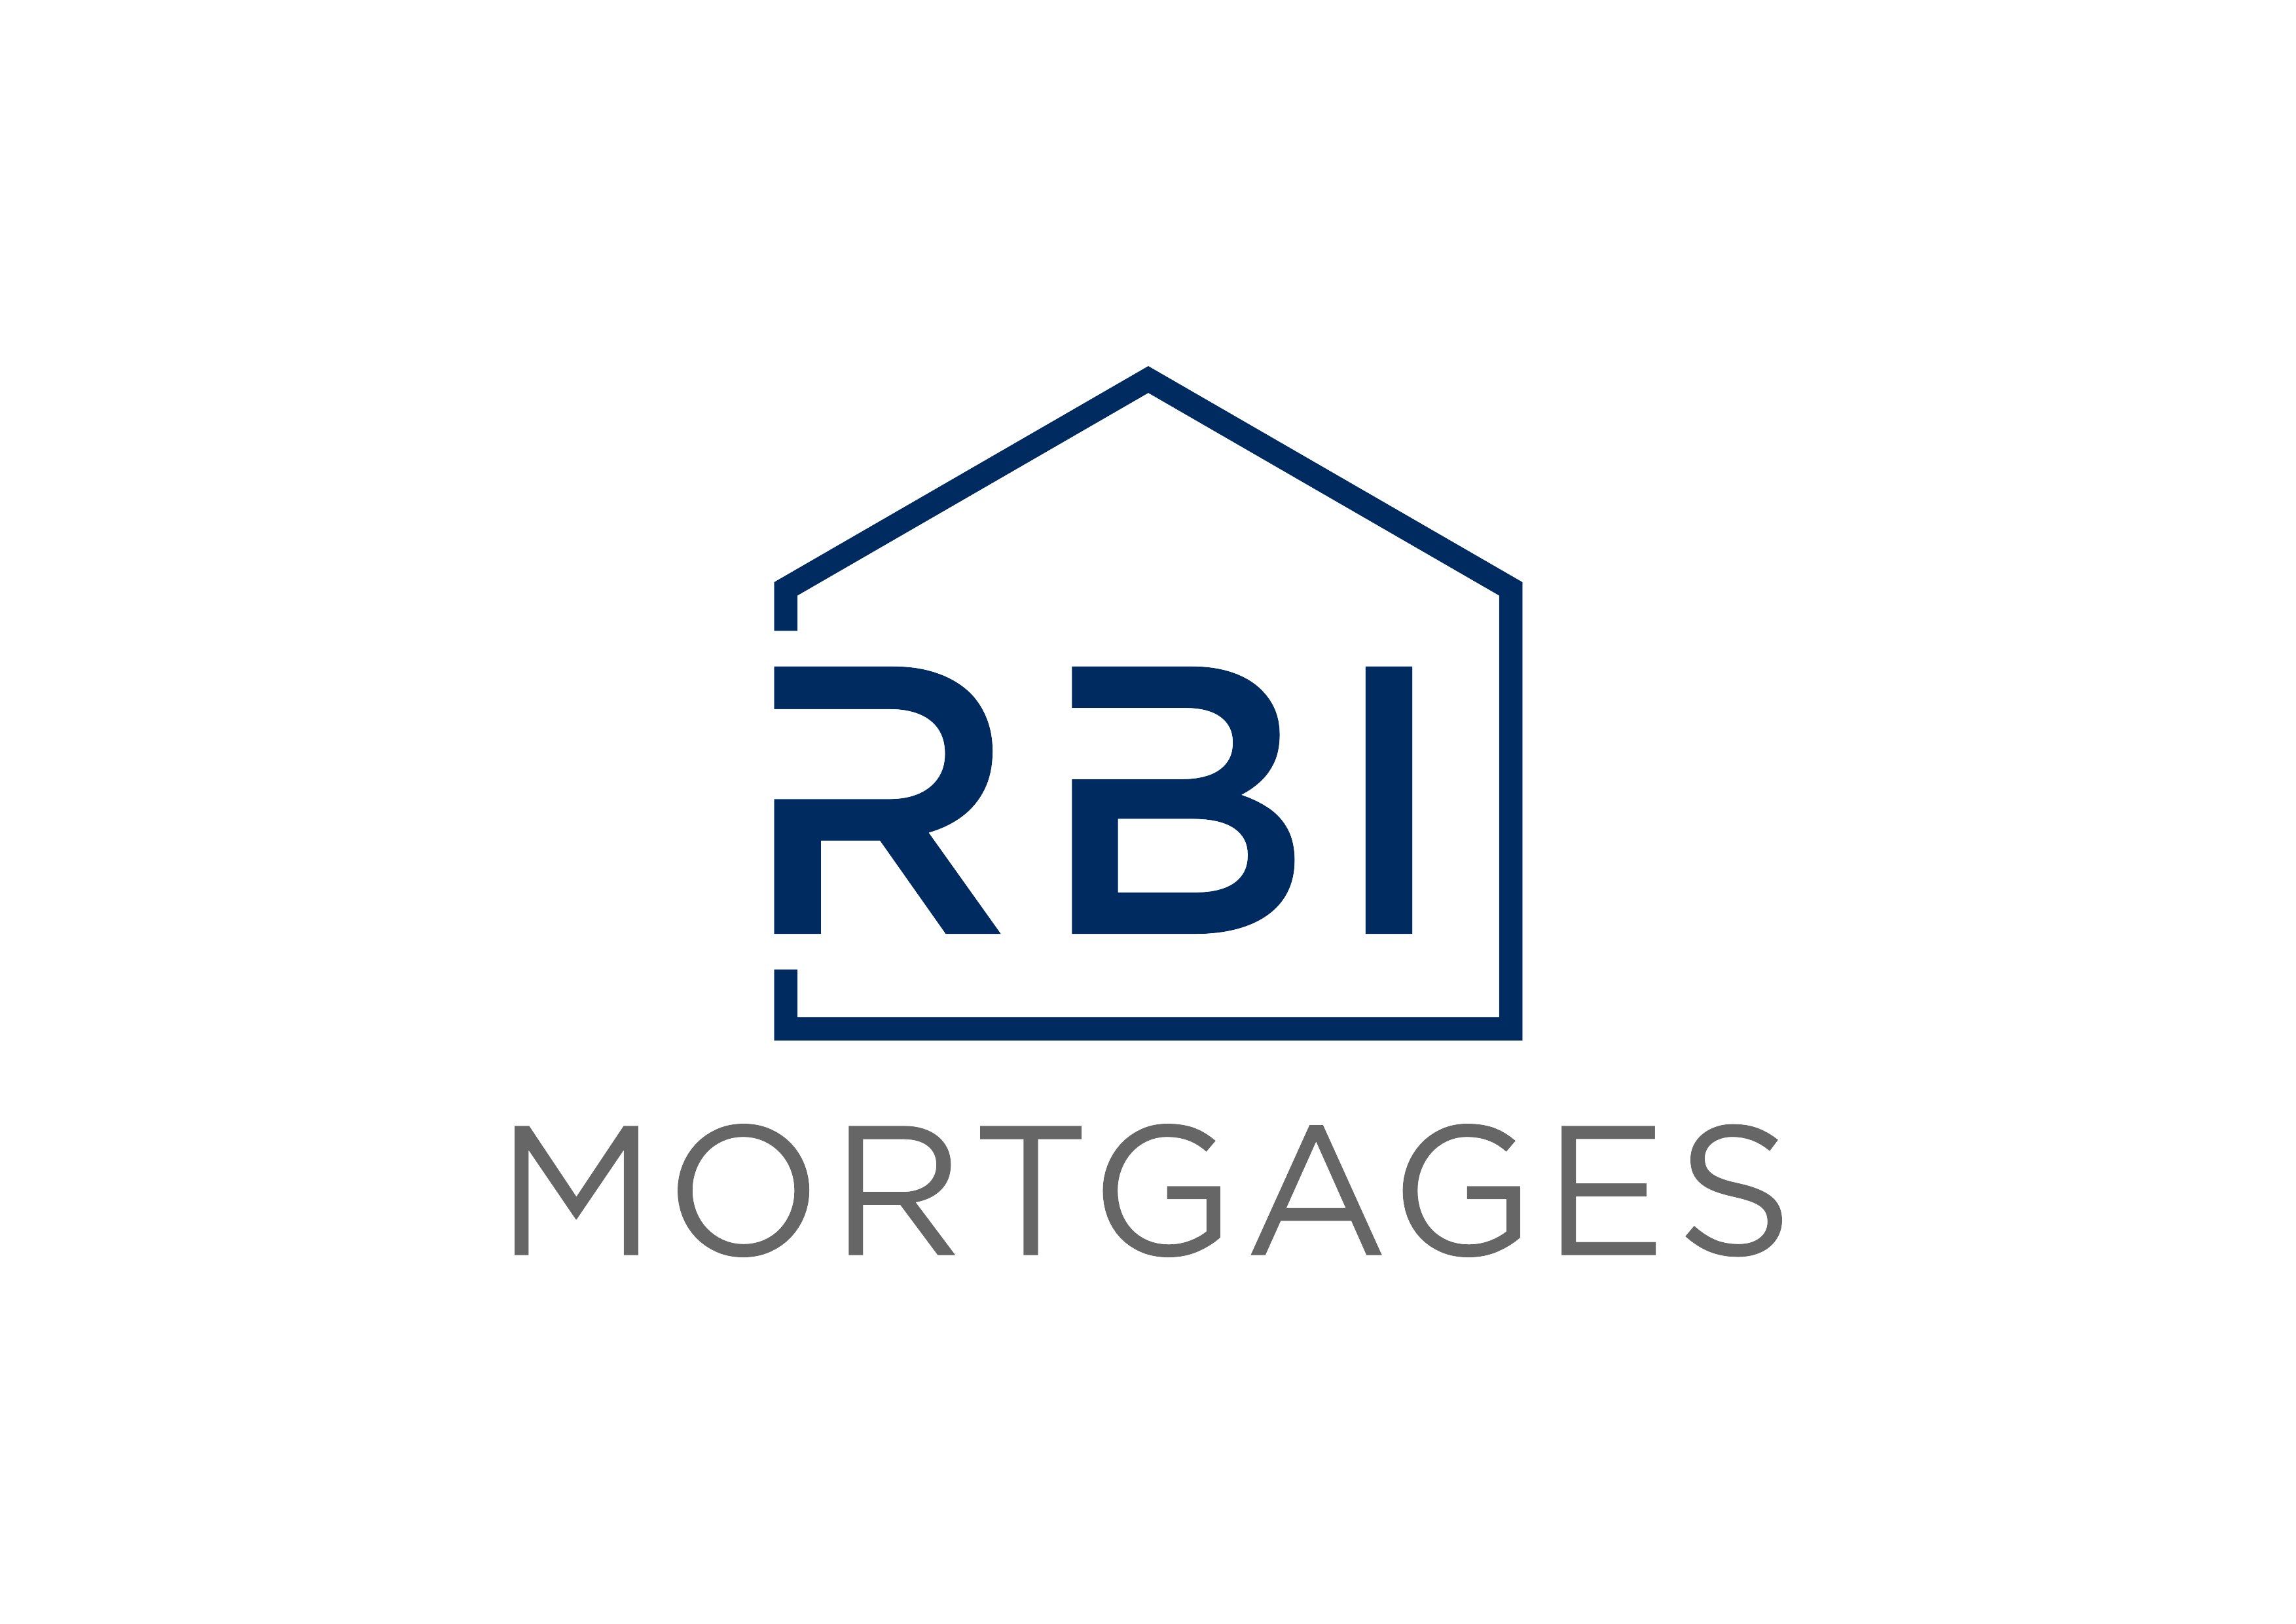 RBI Mortgages LLC